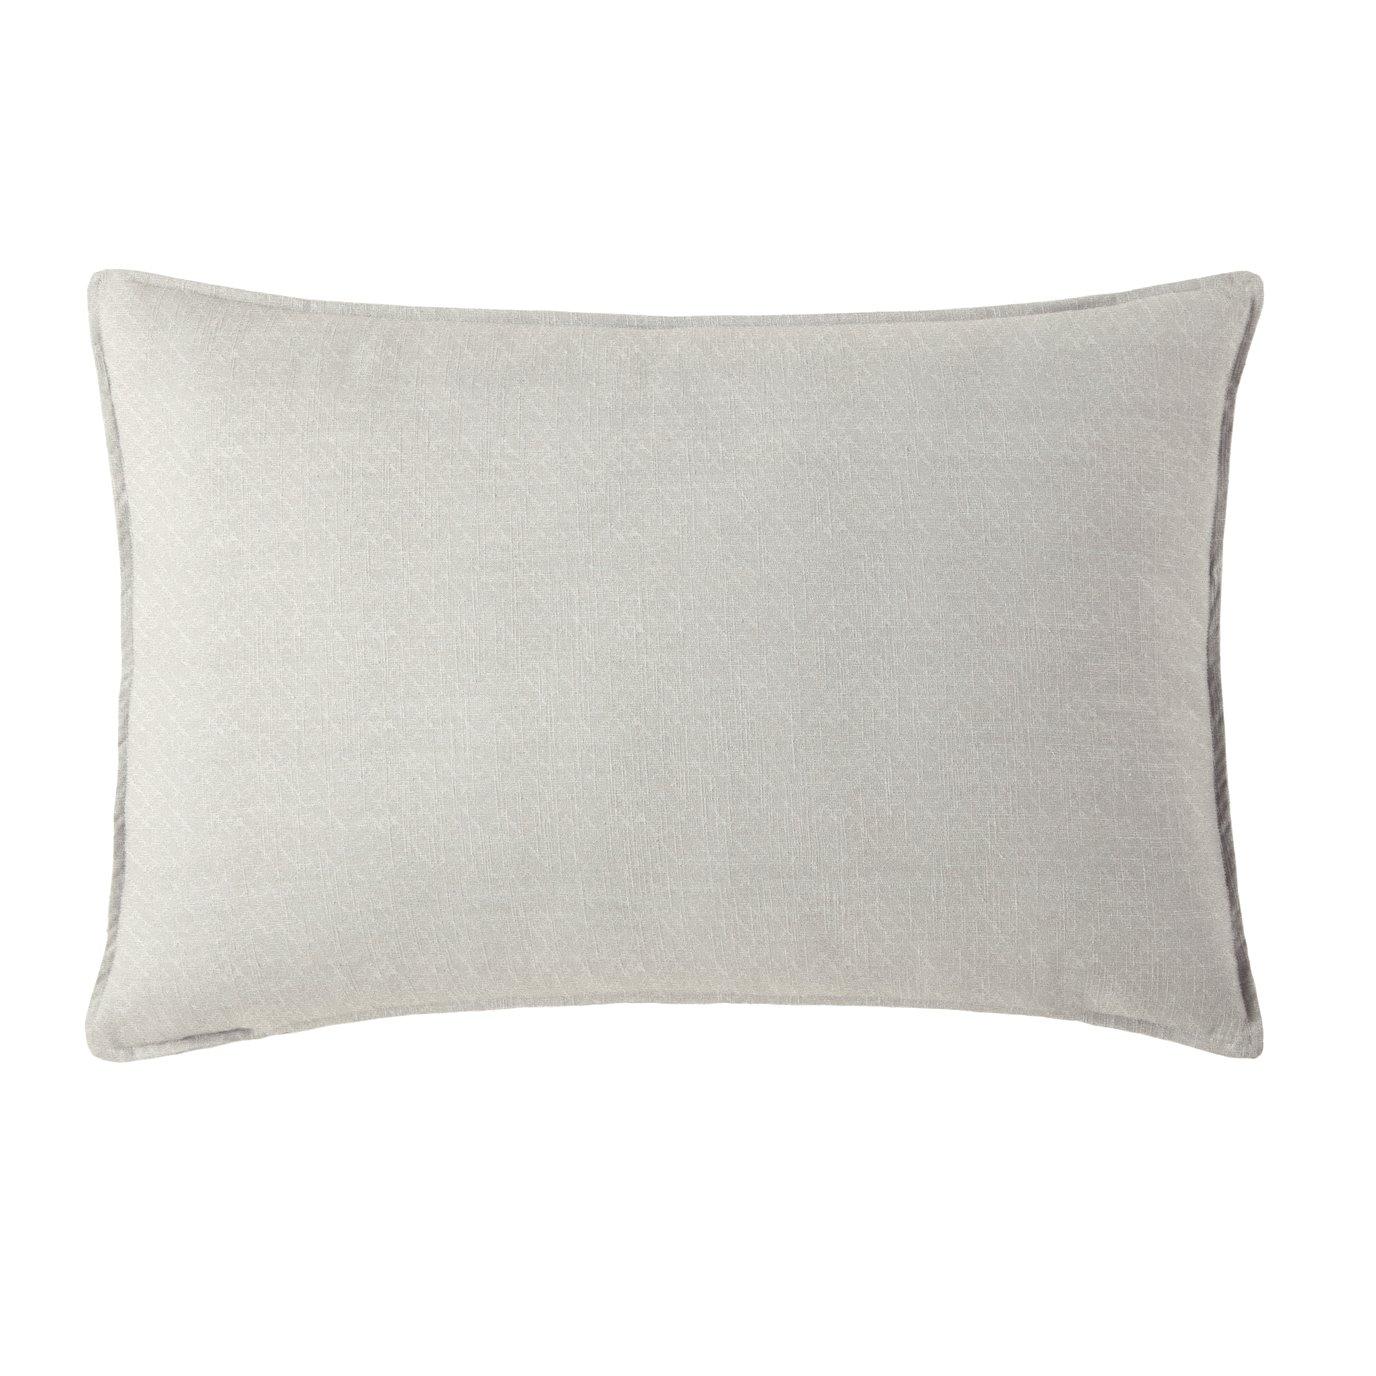 Gosfield Vanilla Pillow Sham Standard/Queen